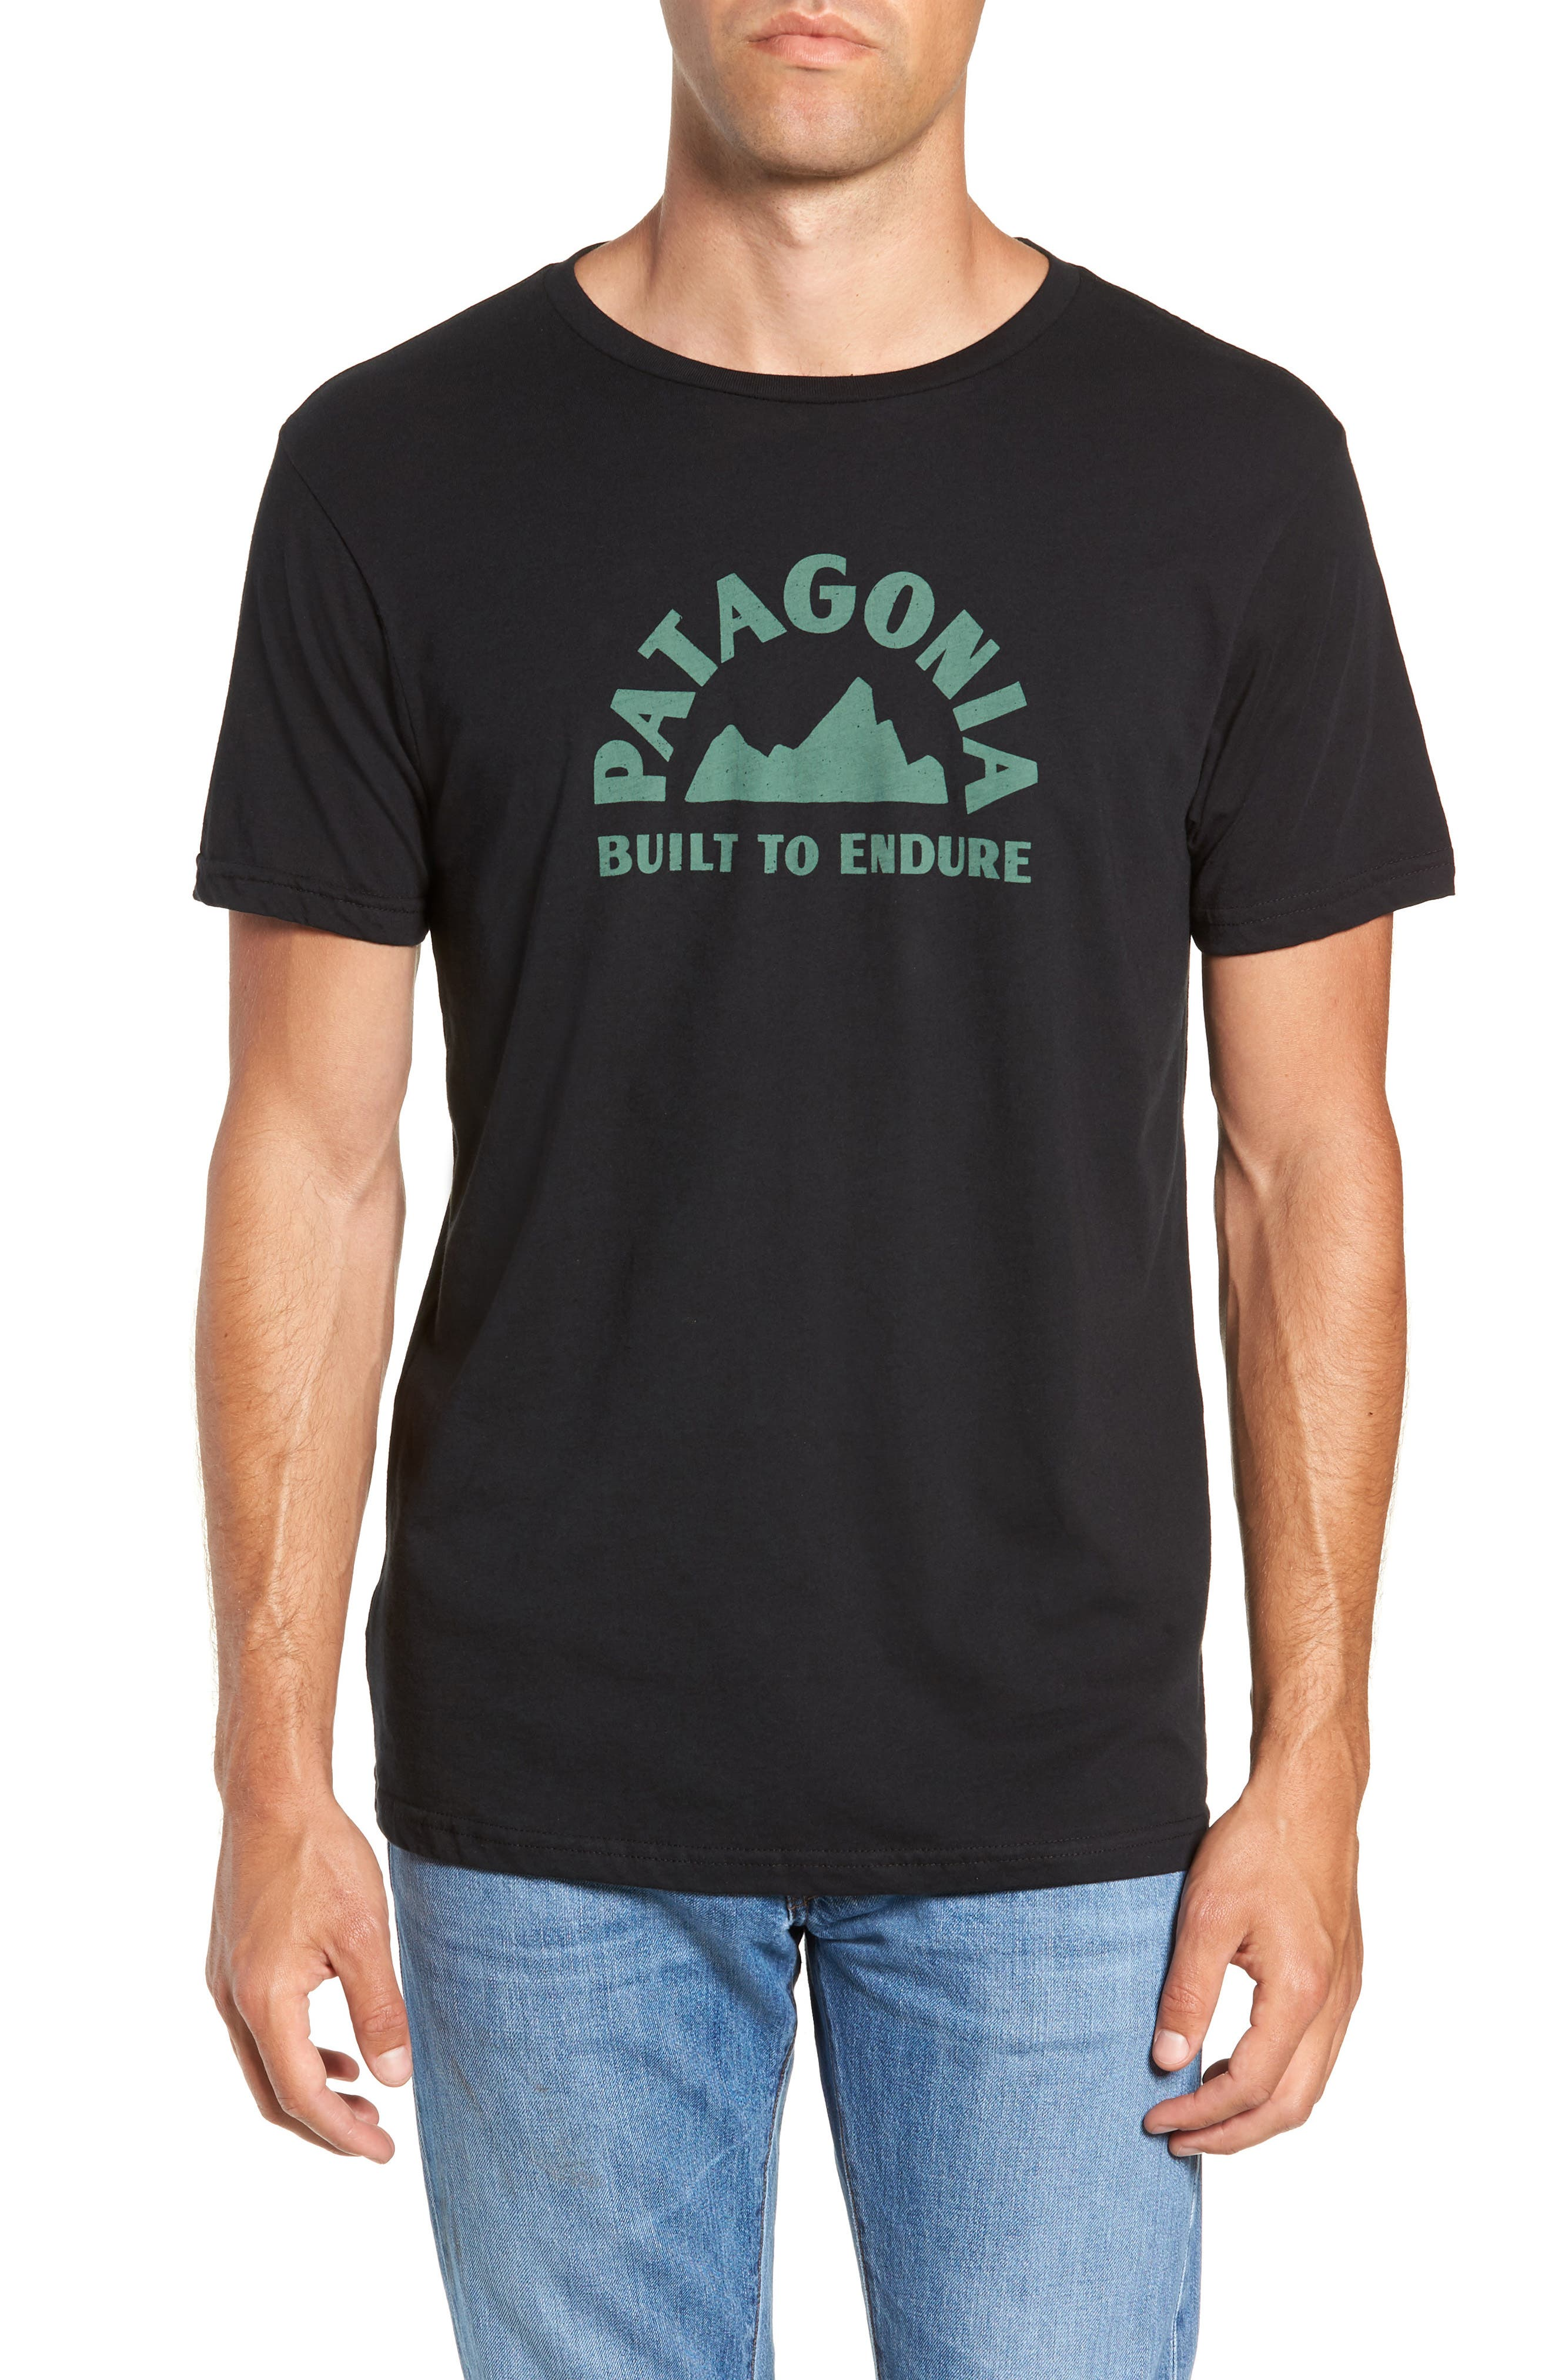 Geologers Organic Cotton T-Shirt,                             Main thumbnail 1, color,                             BLACK